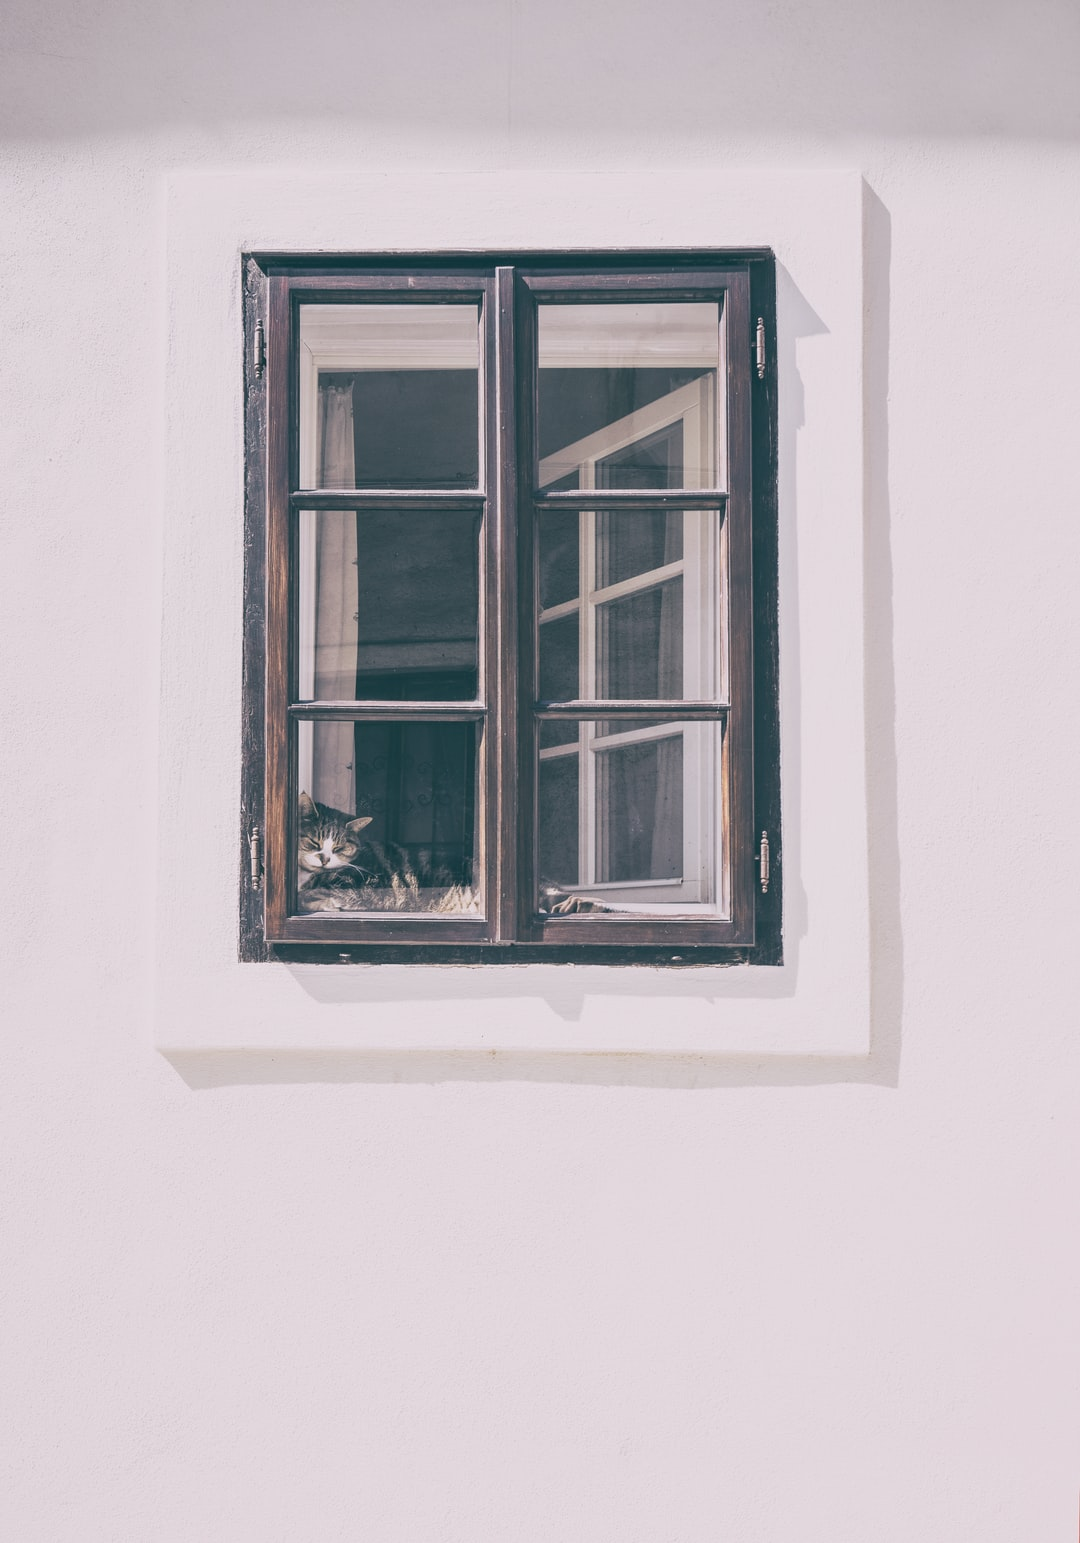 Window frame pictures download free images on unsplash - Sprossenfenster innenliegende sprossen ...